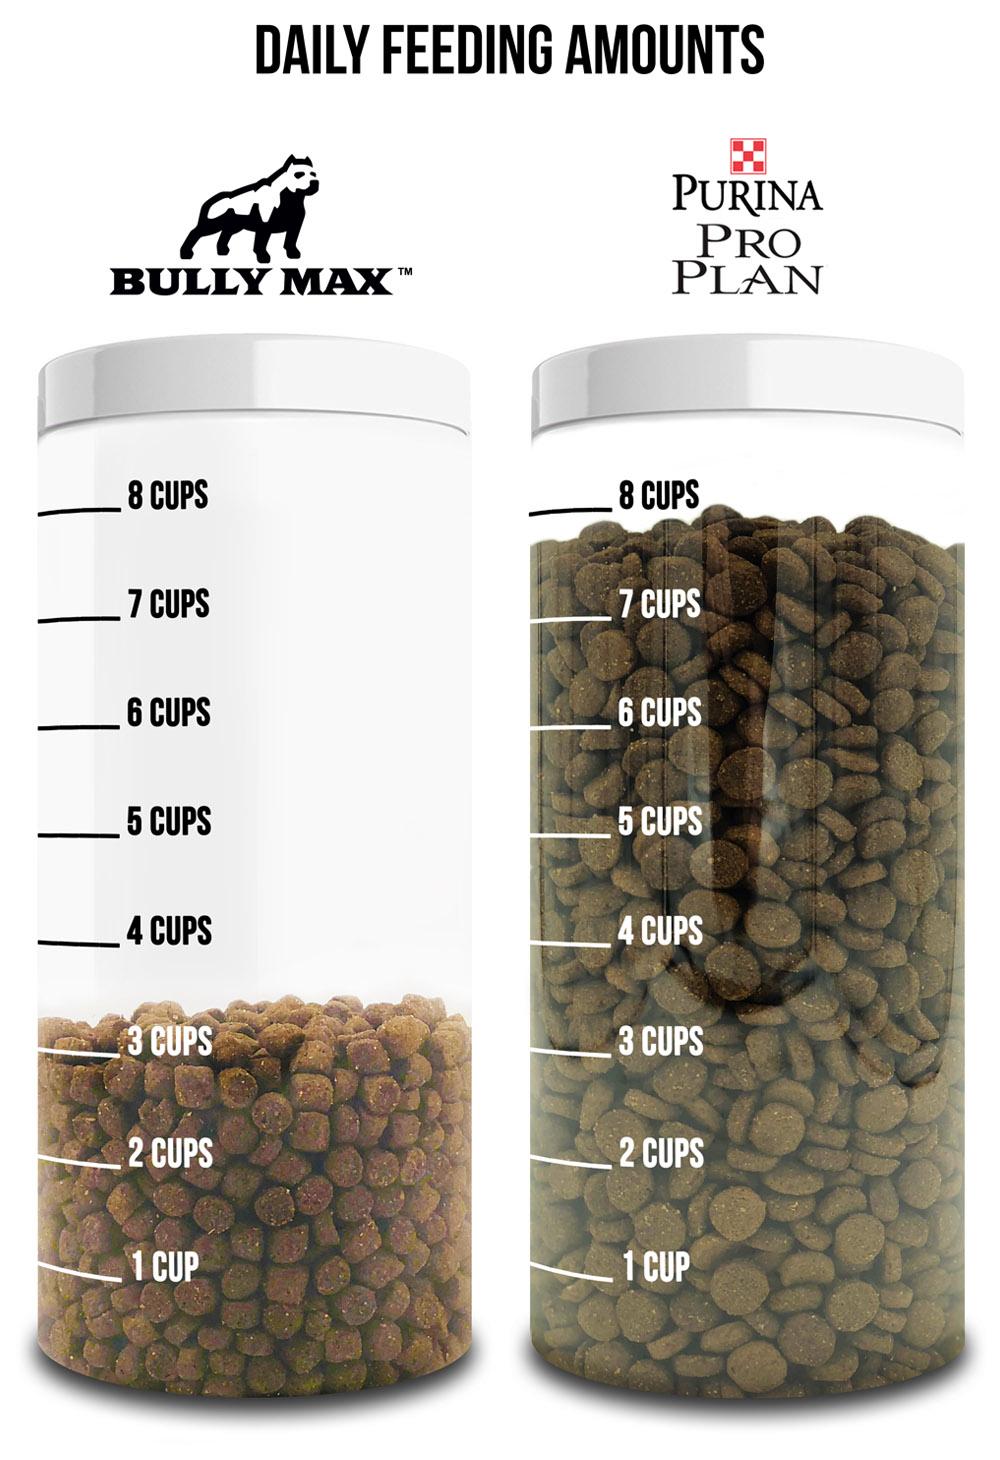 daily-feeding-ammout-proplan-vs-bullymax.jpg